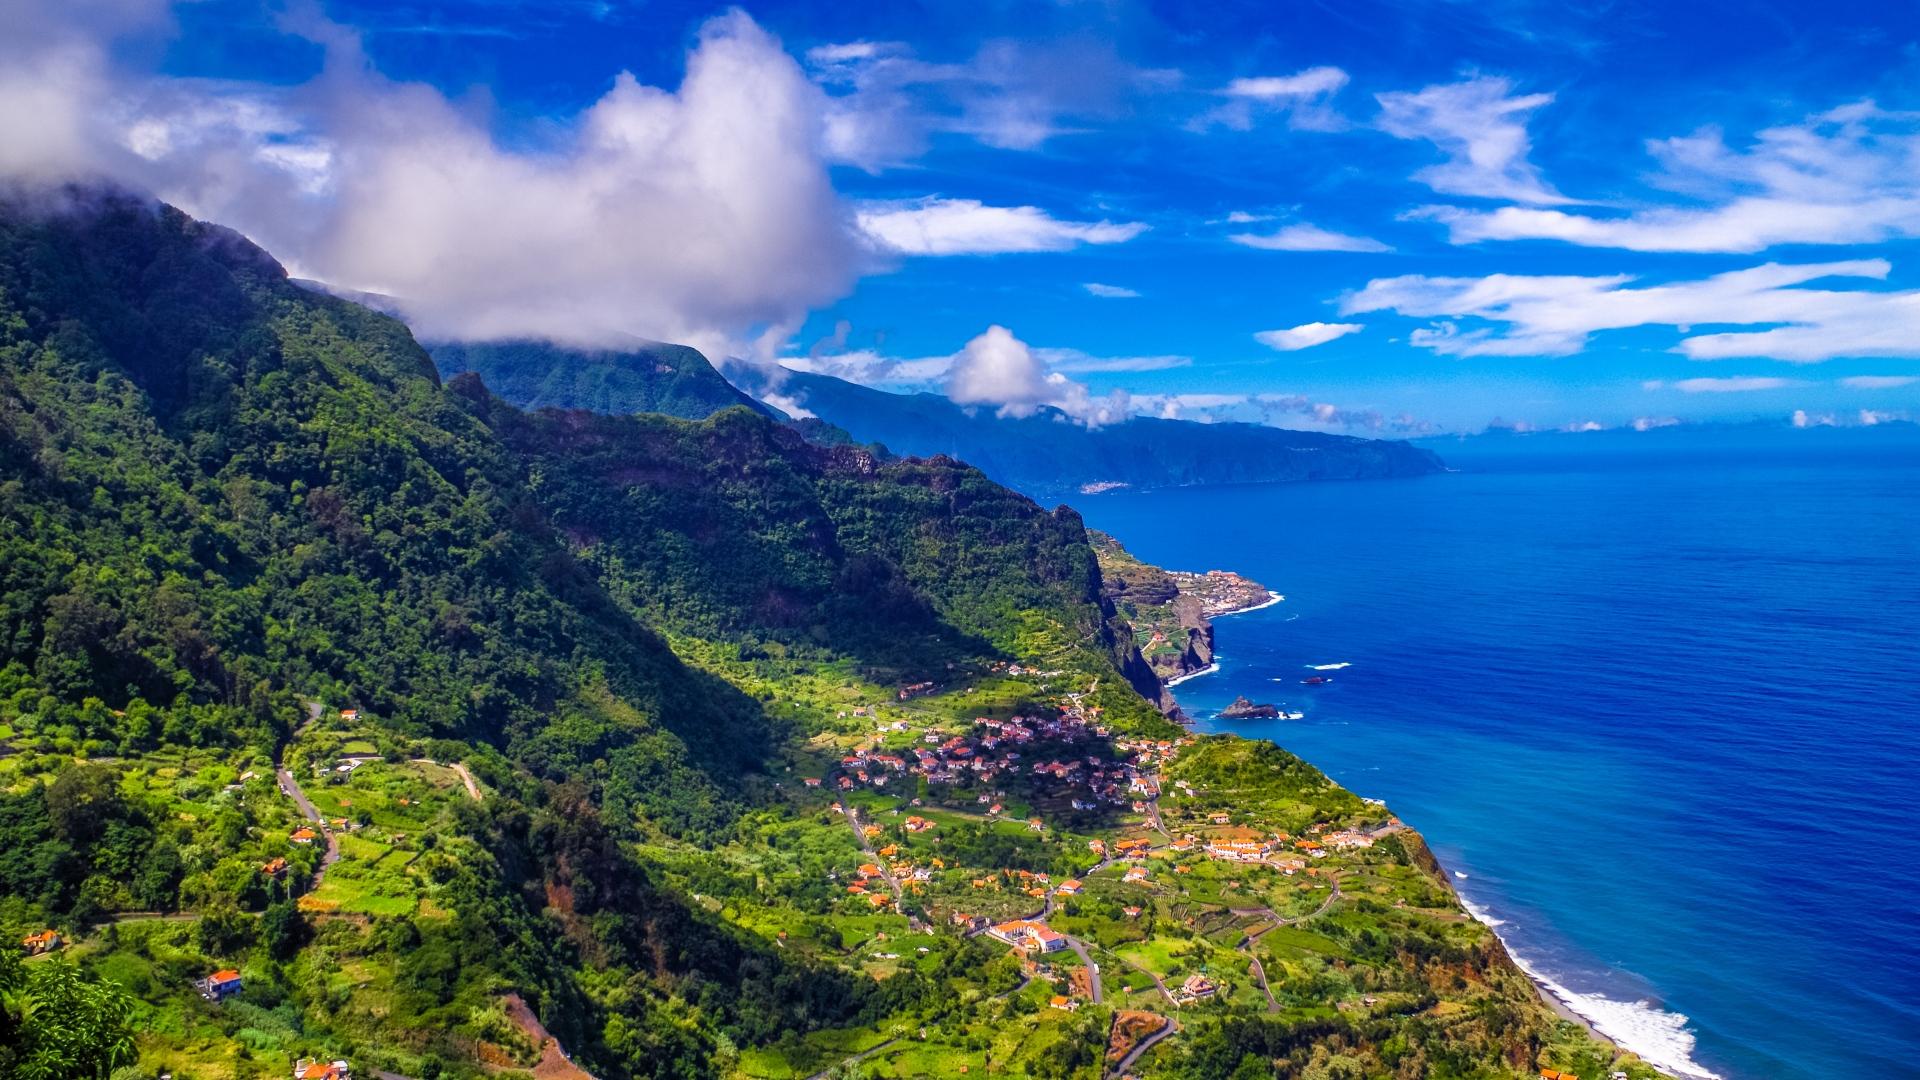 madeira_portugal_island_sea_mountains_112994_1920x1080